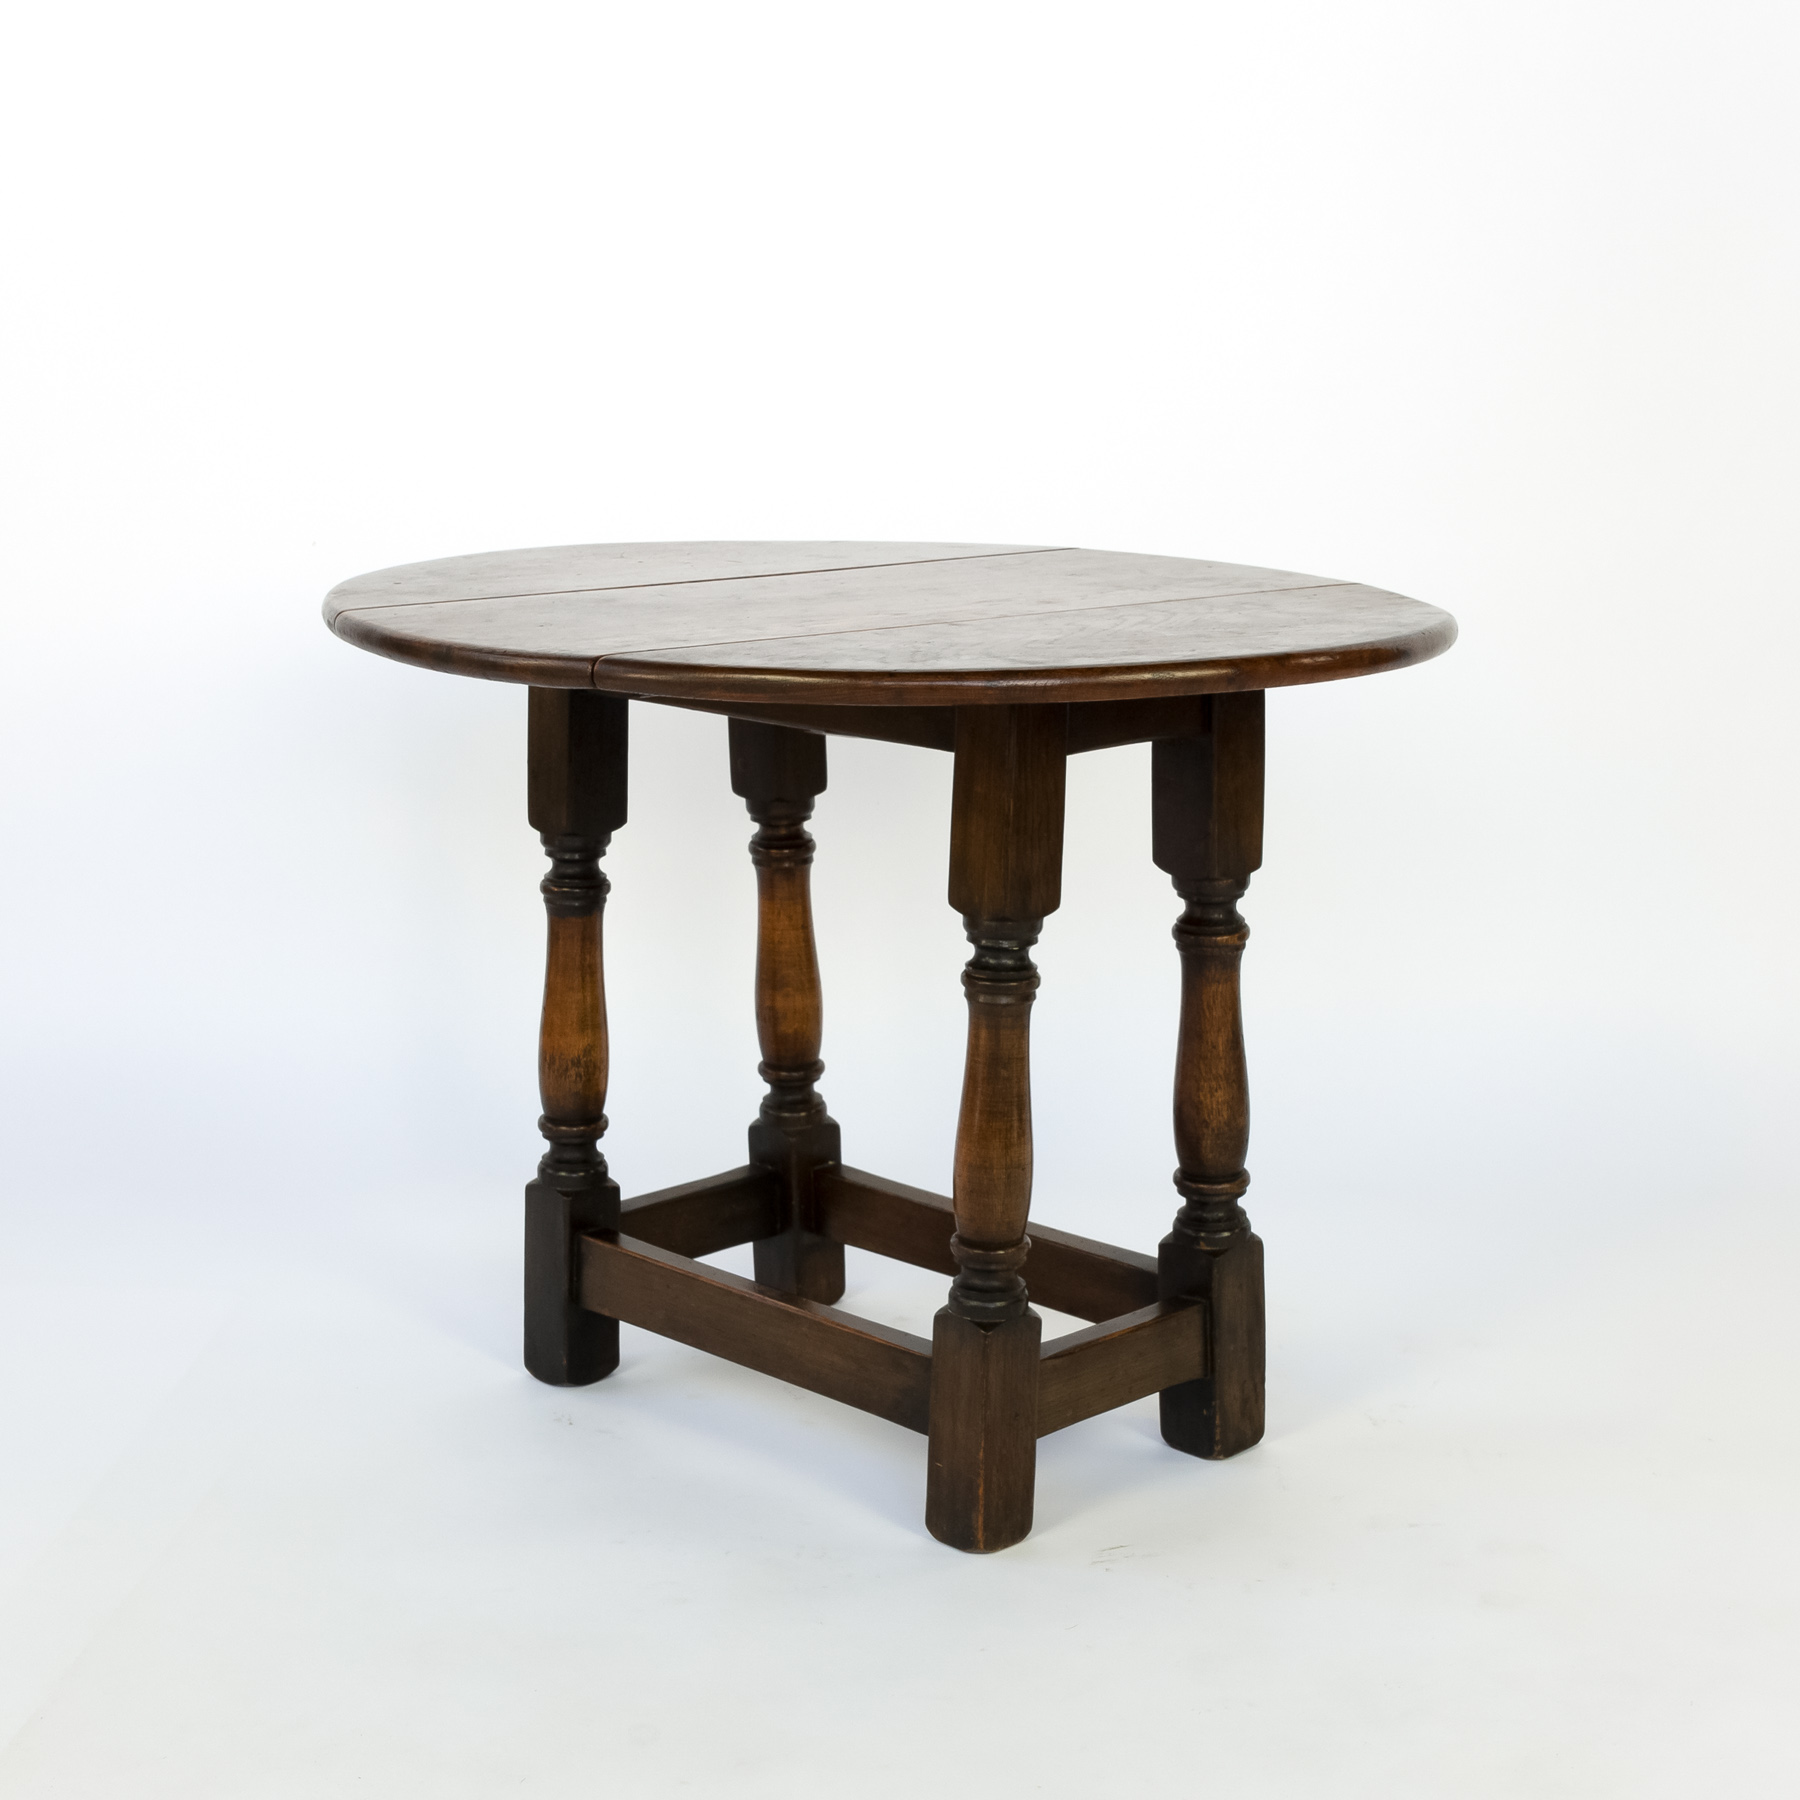 Groovy Very Small Scale Oak Swivel Top Drop Leaf Table English Circa 1890 Machost Co Dining Chair Design Ideas Machostcouk